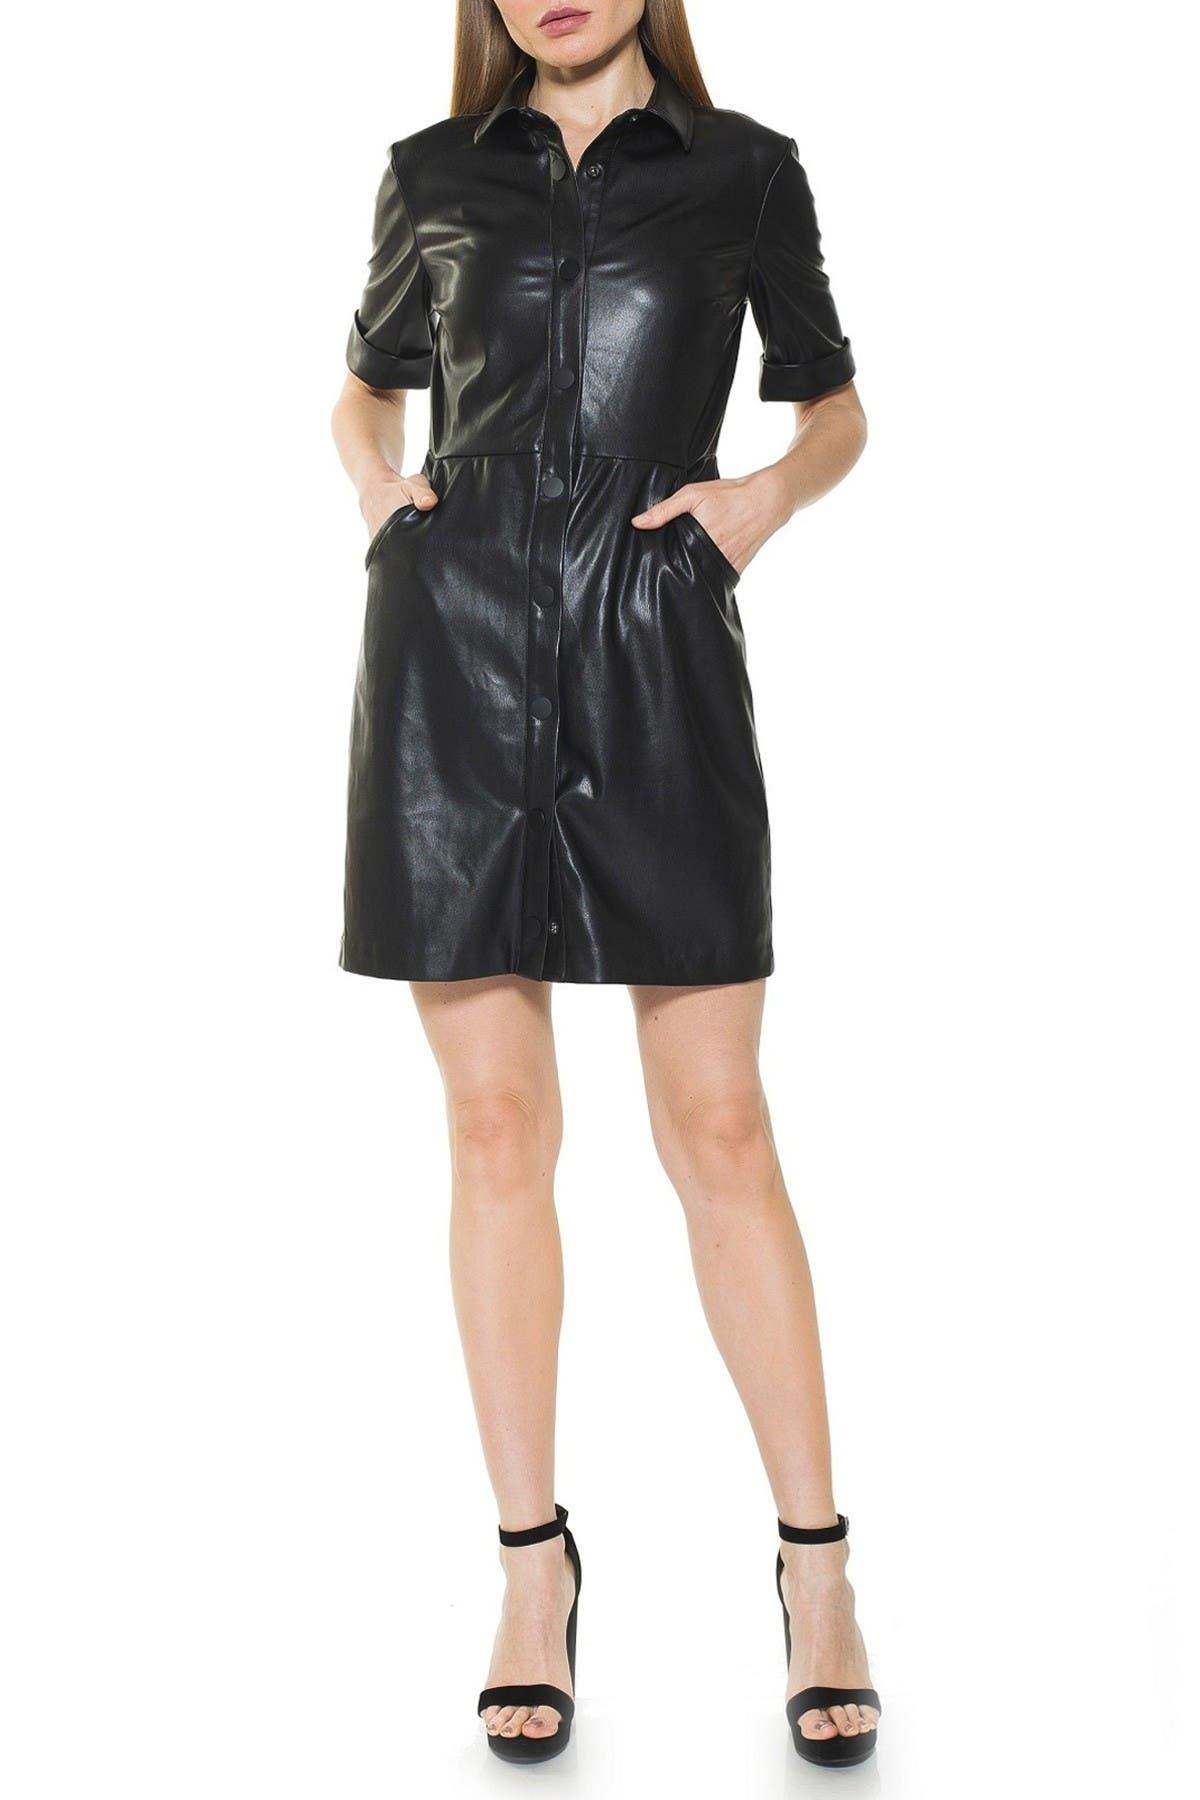 Image of Alexia Admor Janine Faux Leather Short Sleeve Dress